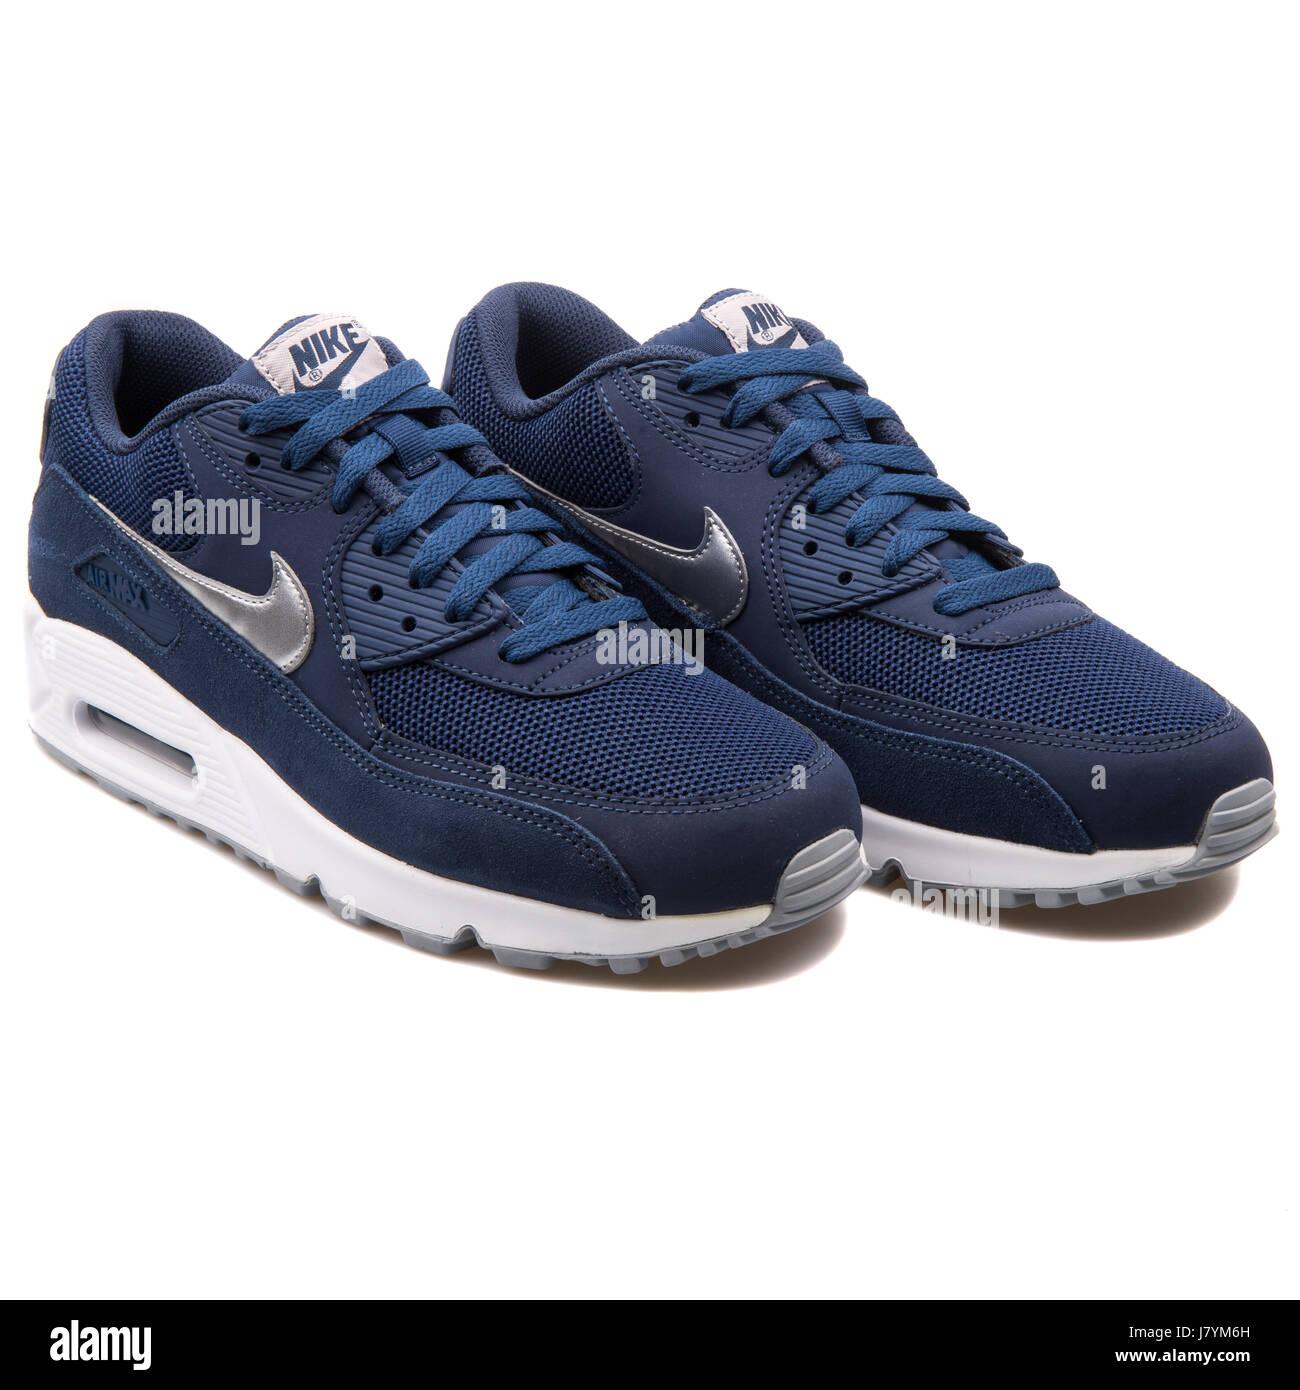 106a90deadc Nike Air Max 90 hombres azules esenciales zapatillas deportivas - 537384-411